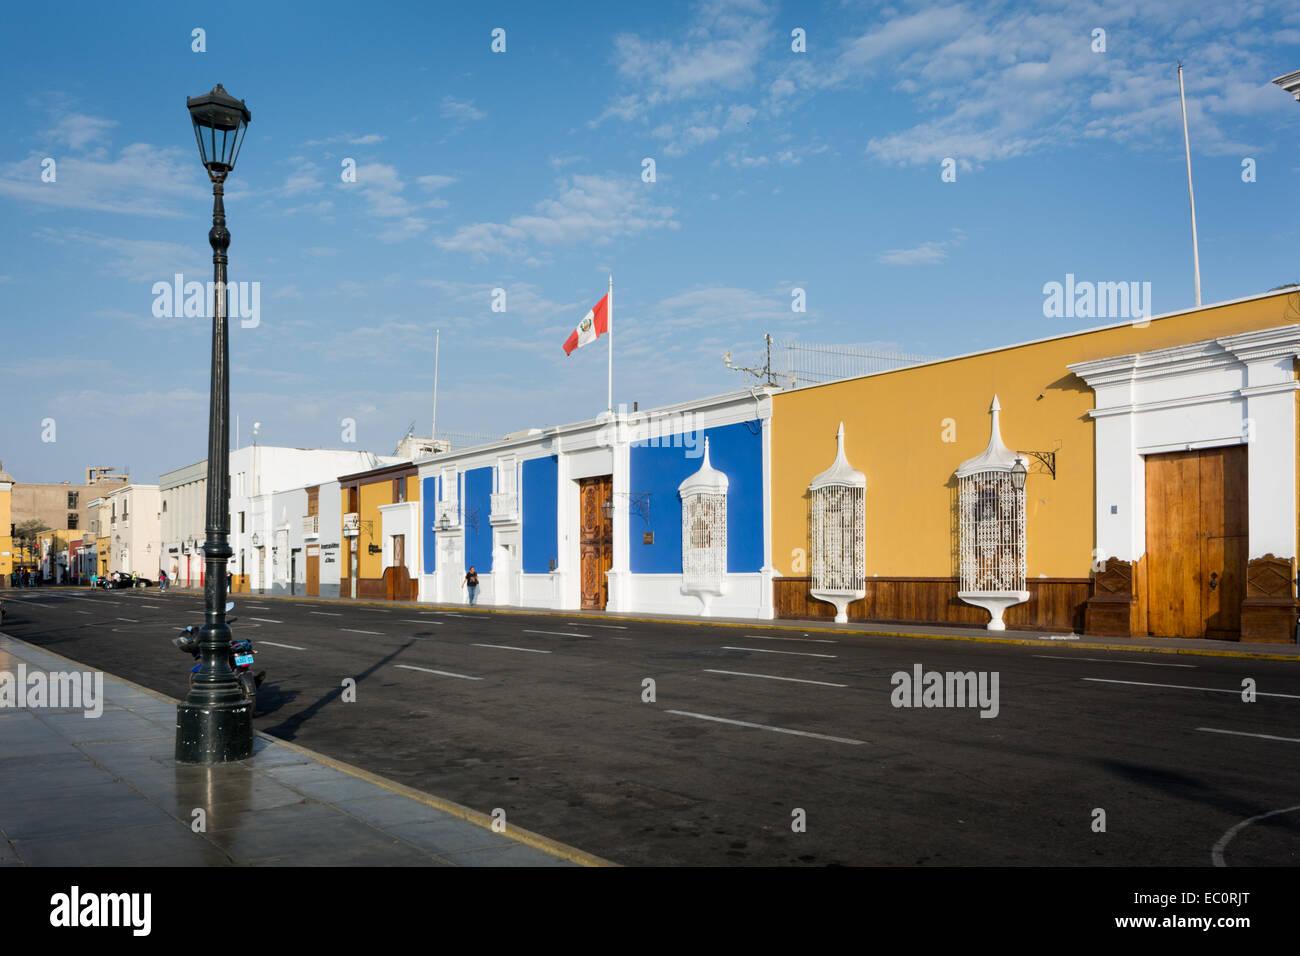 Colonial Style Buildings around the Main Square of Trujillo, Peru - Stock Image